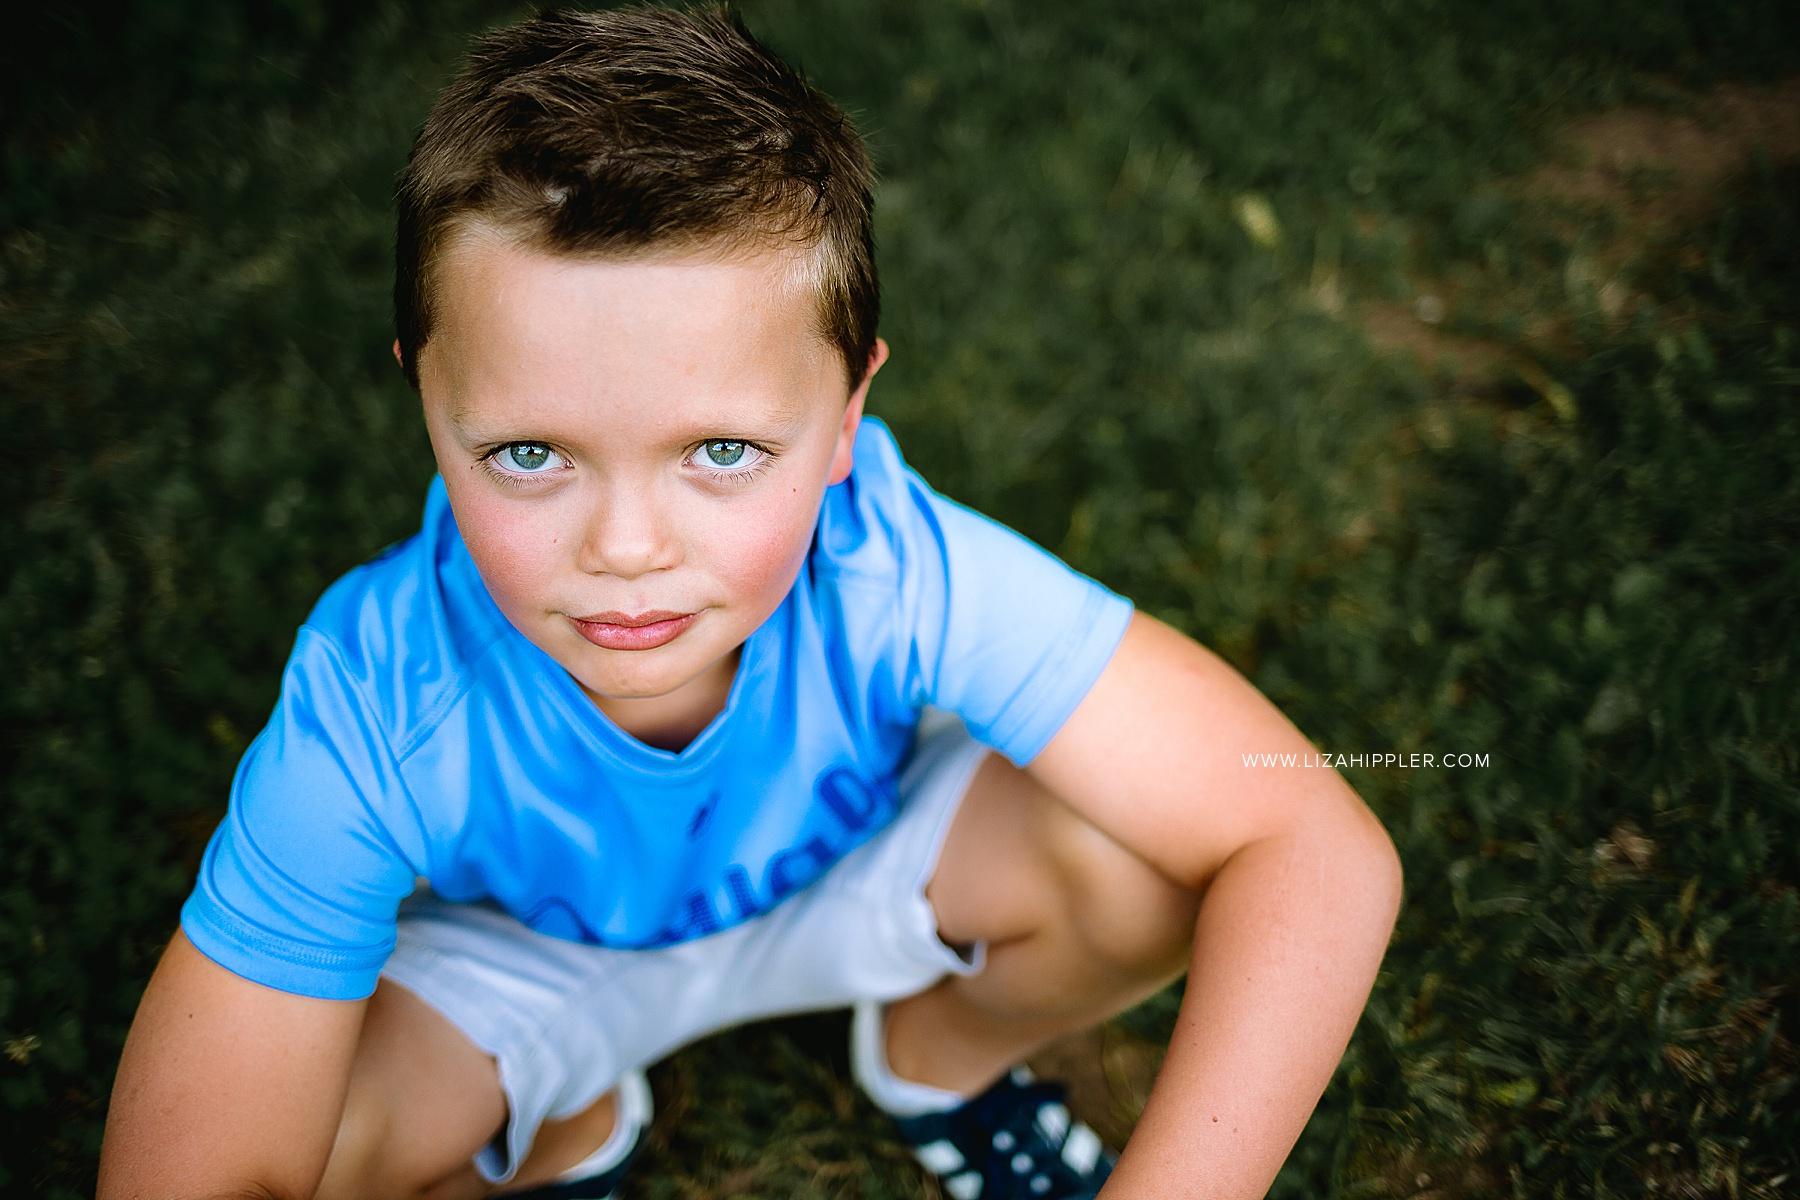 blue-eyed boy looks up at camera